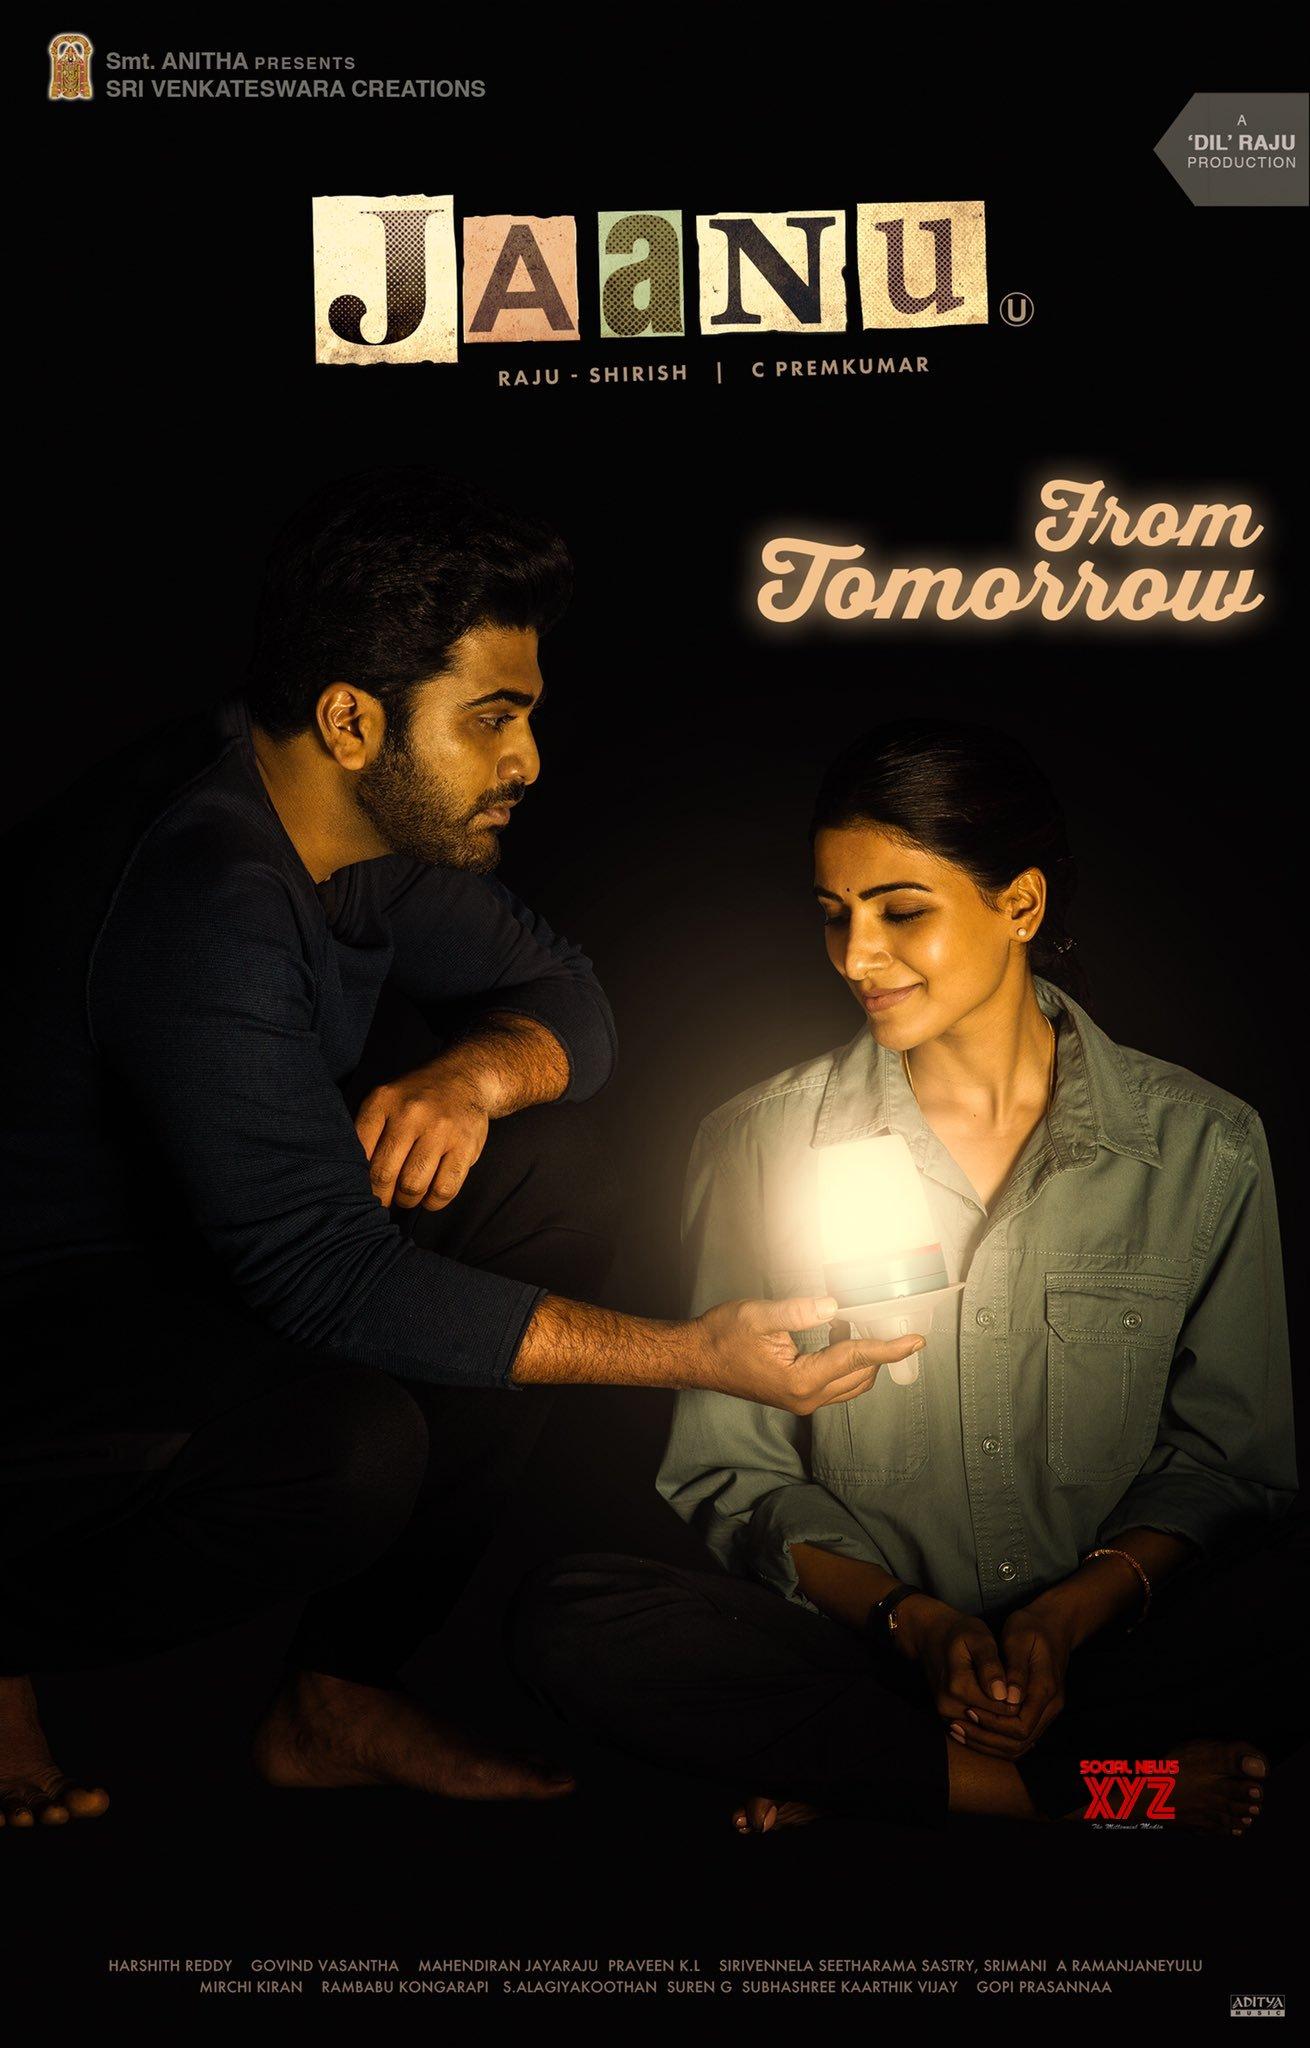 Sharwanand And Samantha S Jaanu Movie From Tomorrow Poster Social News Xyz